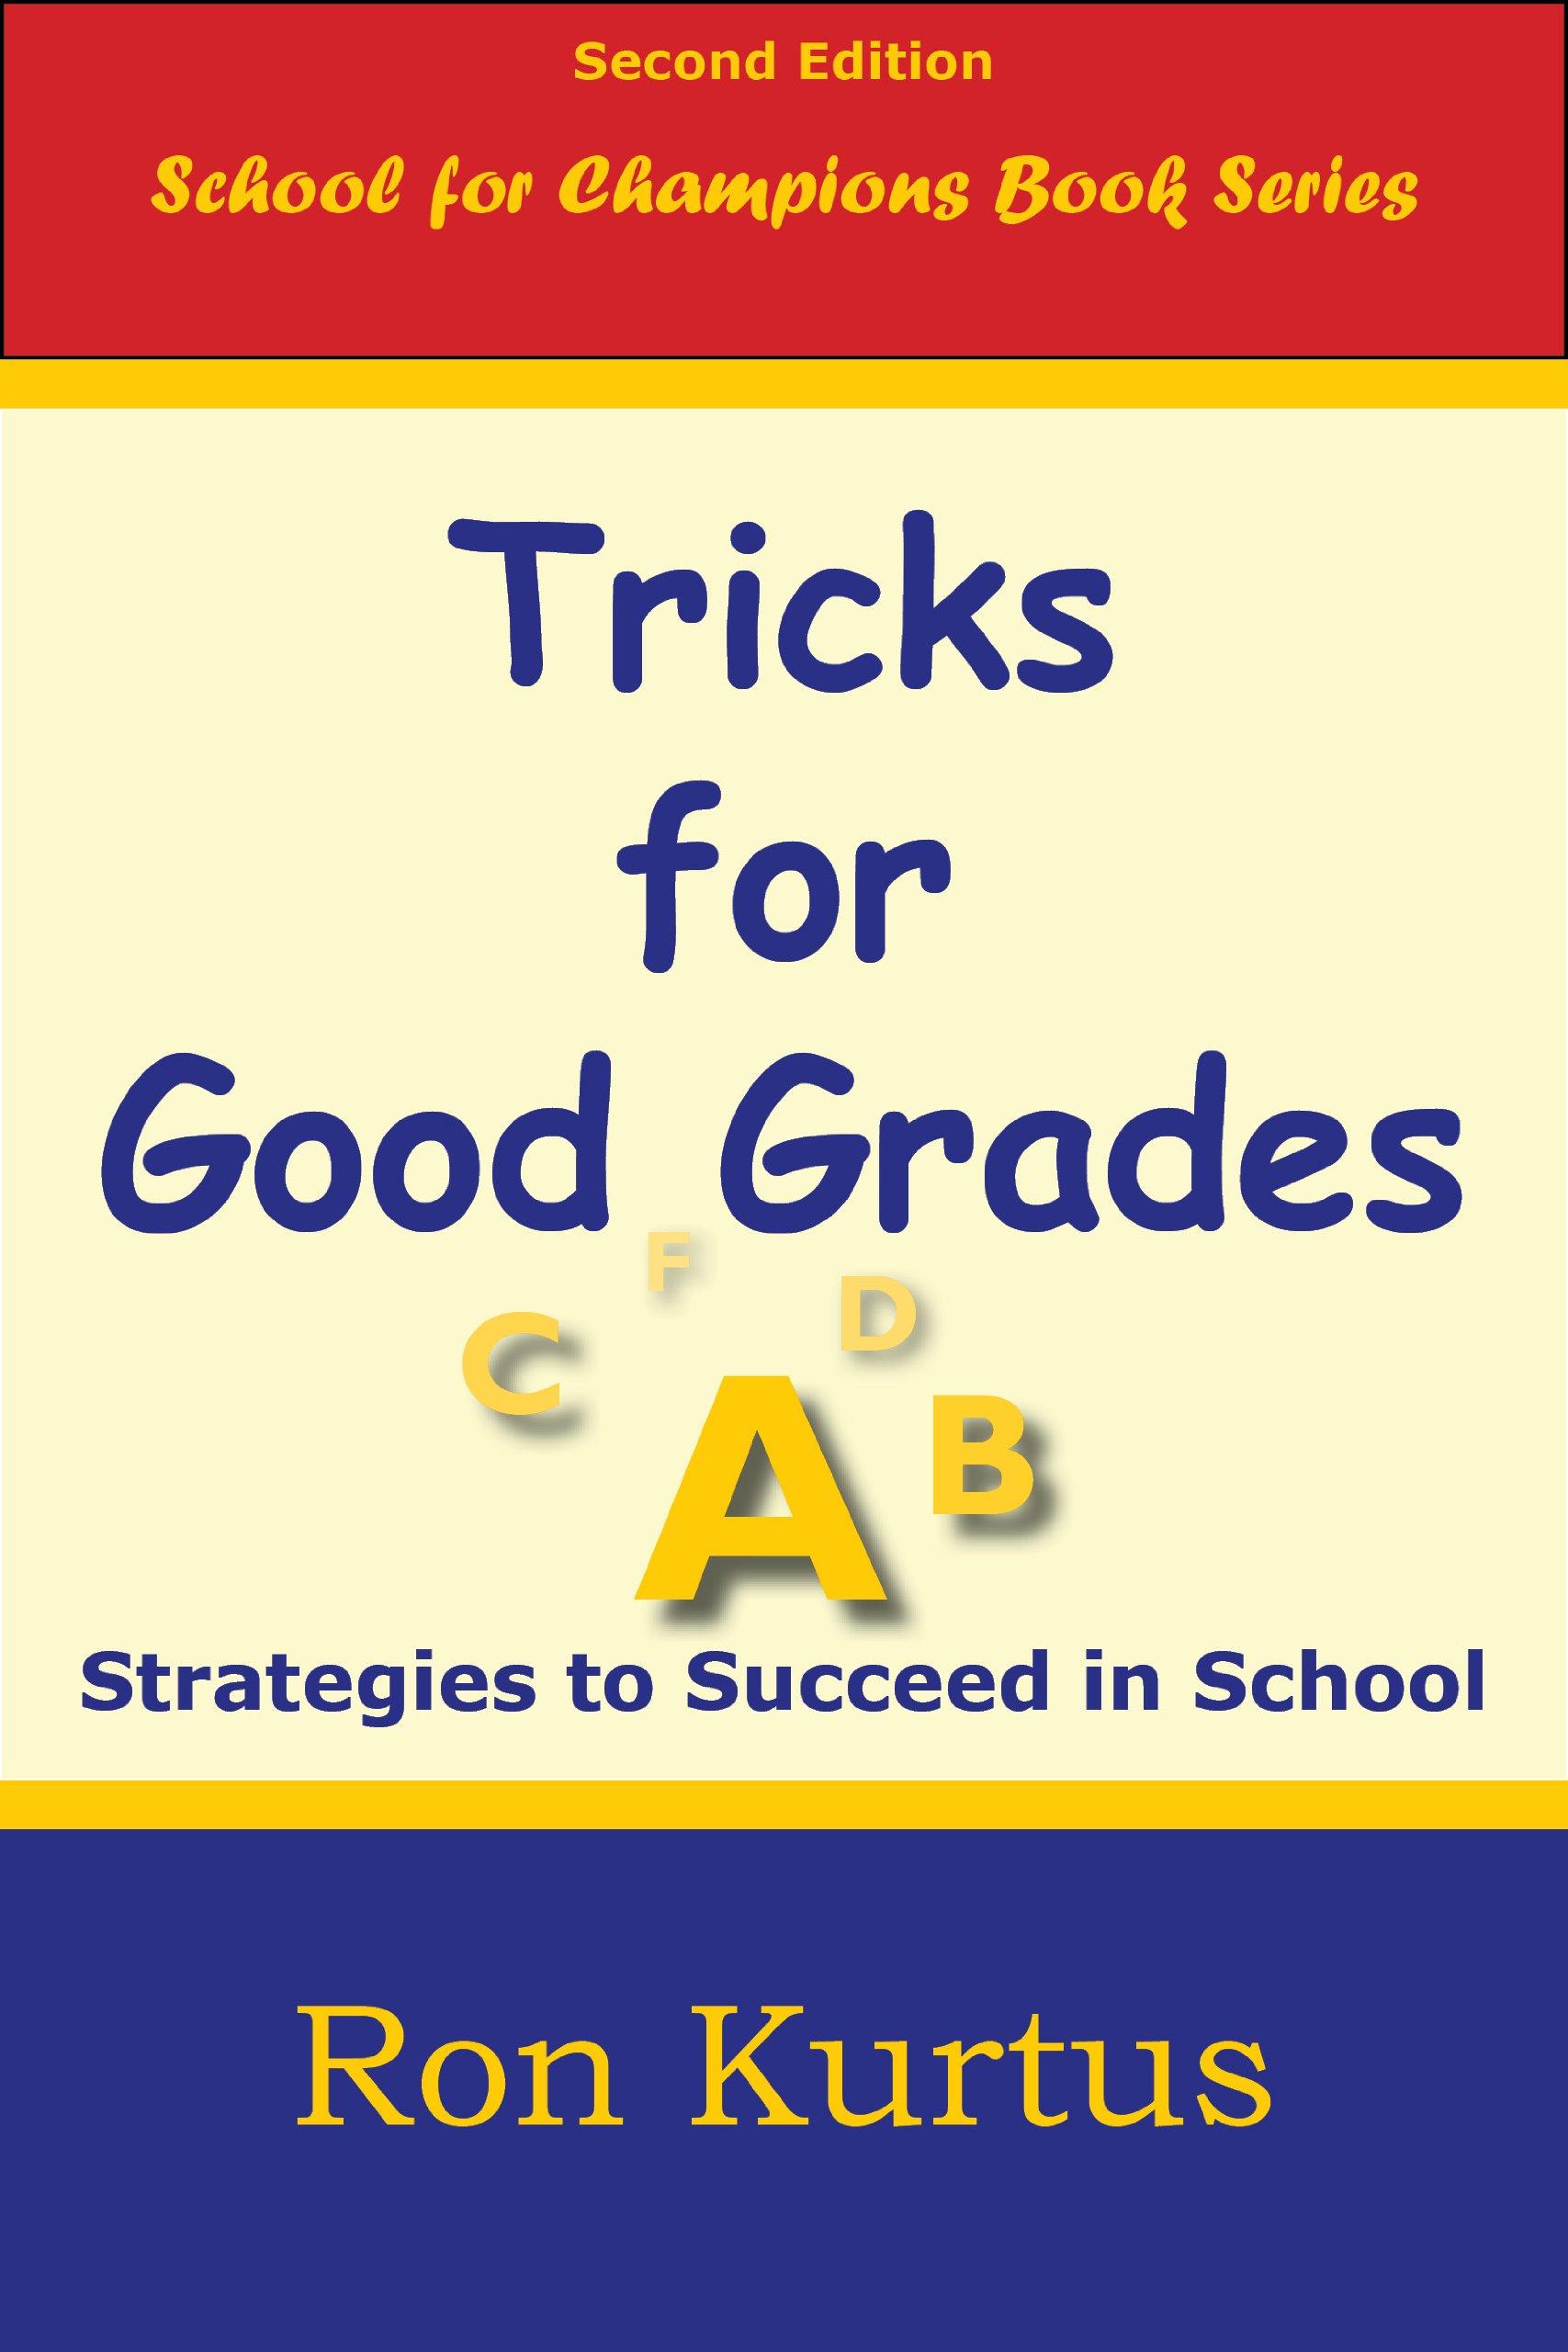 Tricks for Good Grades (Second Edition) pdf